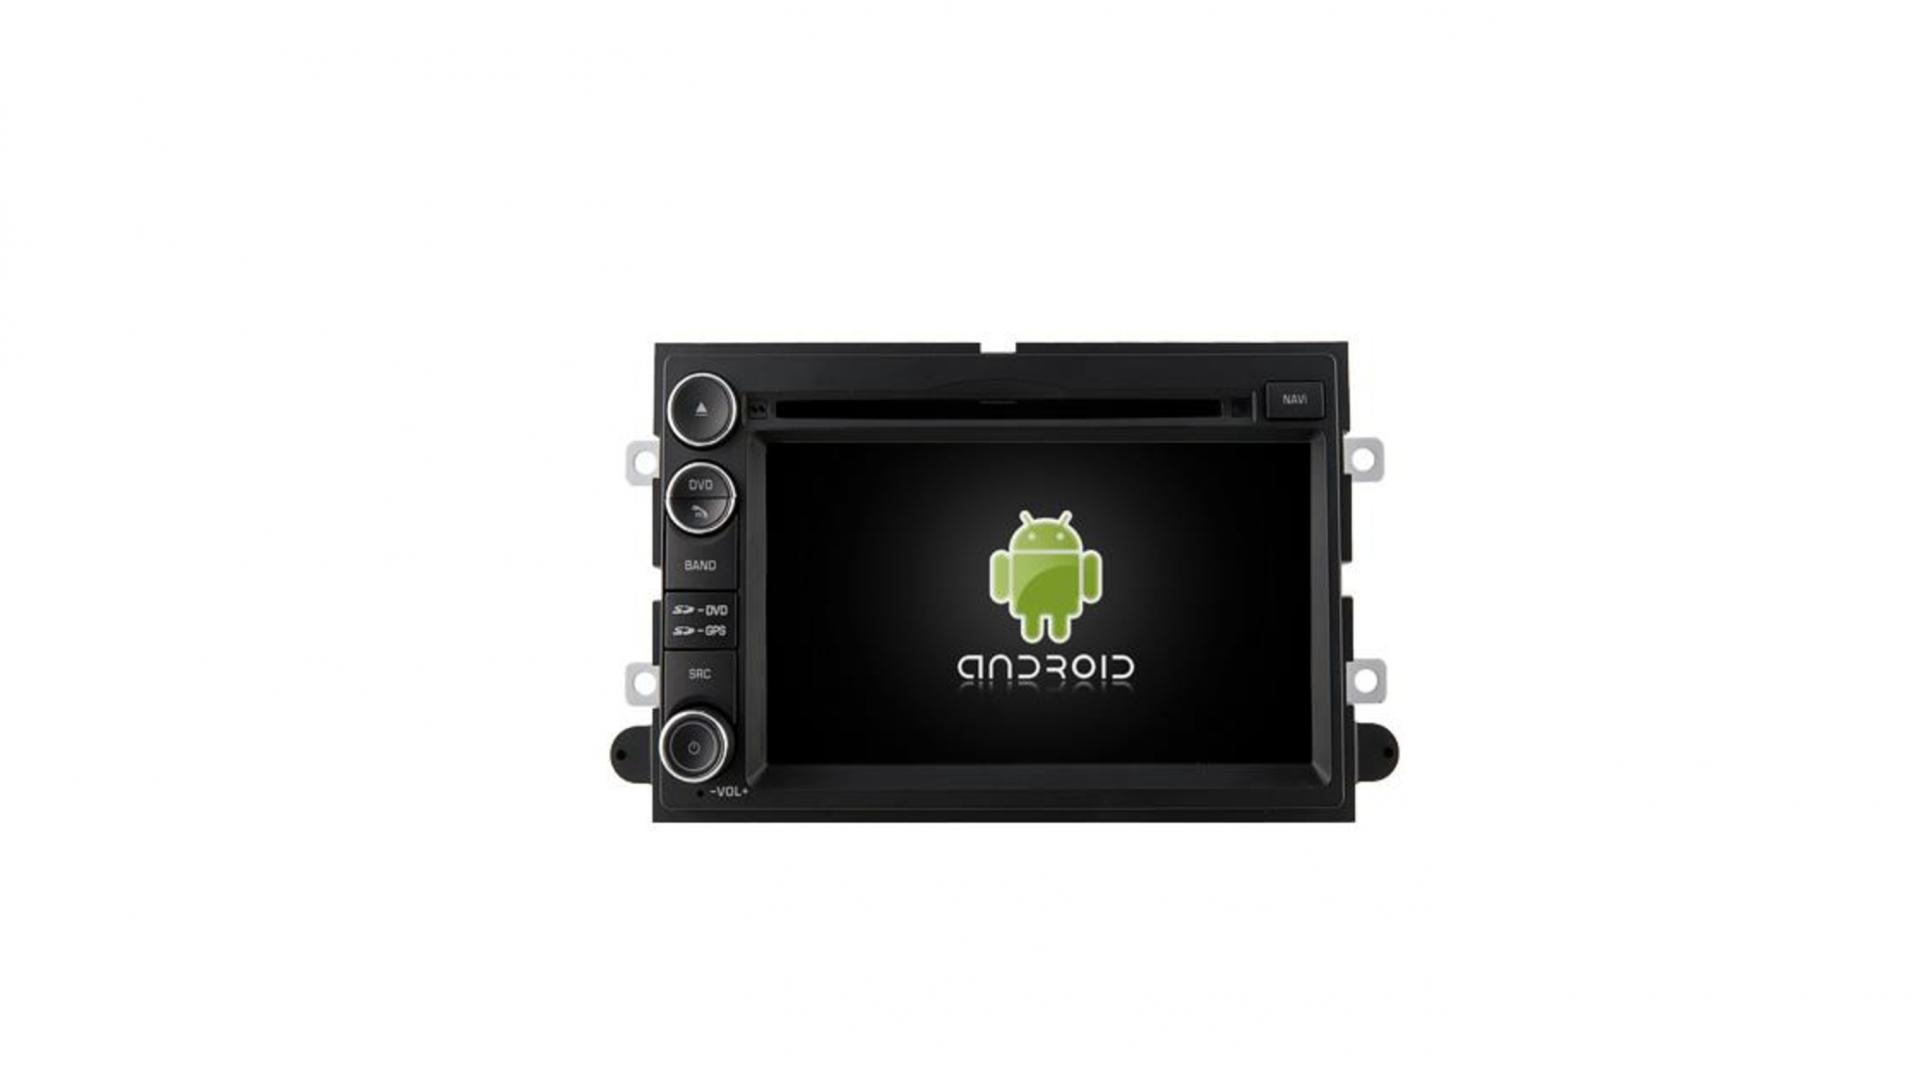 Autoradio gps bluetooth ford mustang explorer edge fusion focus android camera de recul commande au volant ipod tv dvbt 3g 4g pas cher wifi poste usb sd tnt double 2 din canbus iph